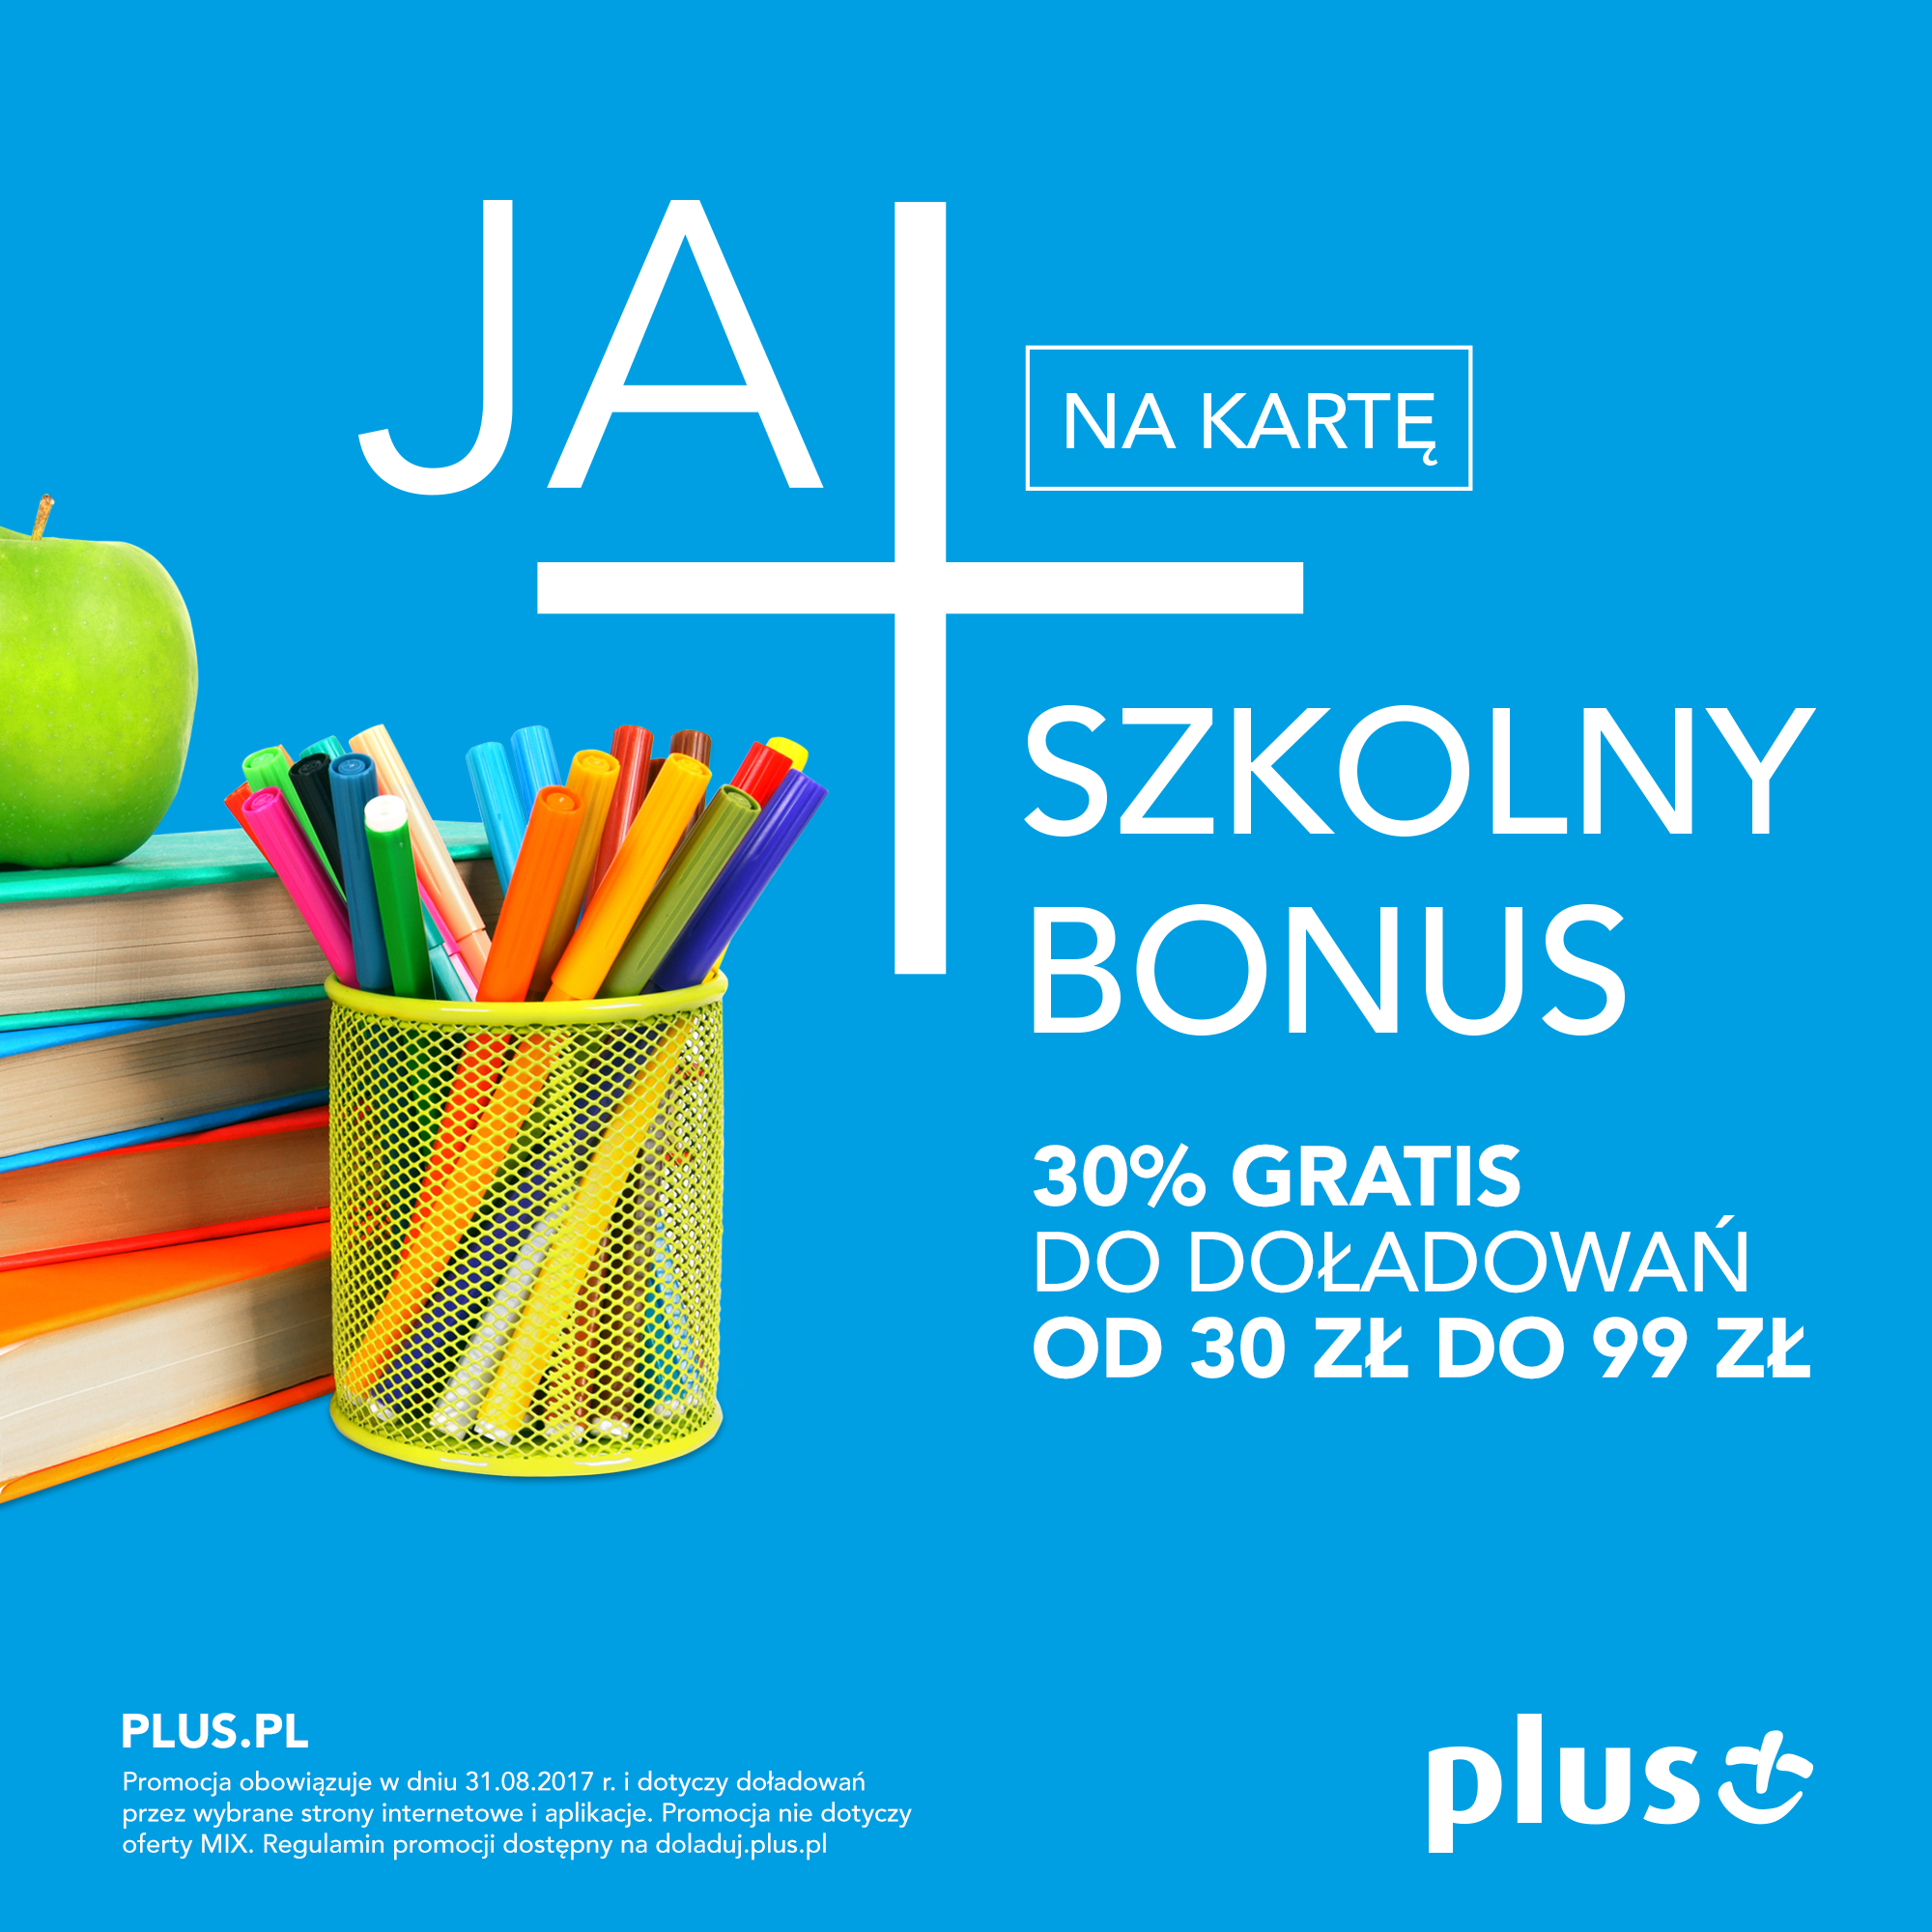 szkolny bonus